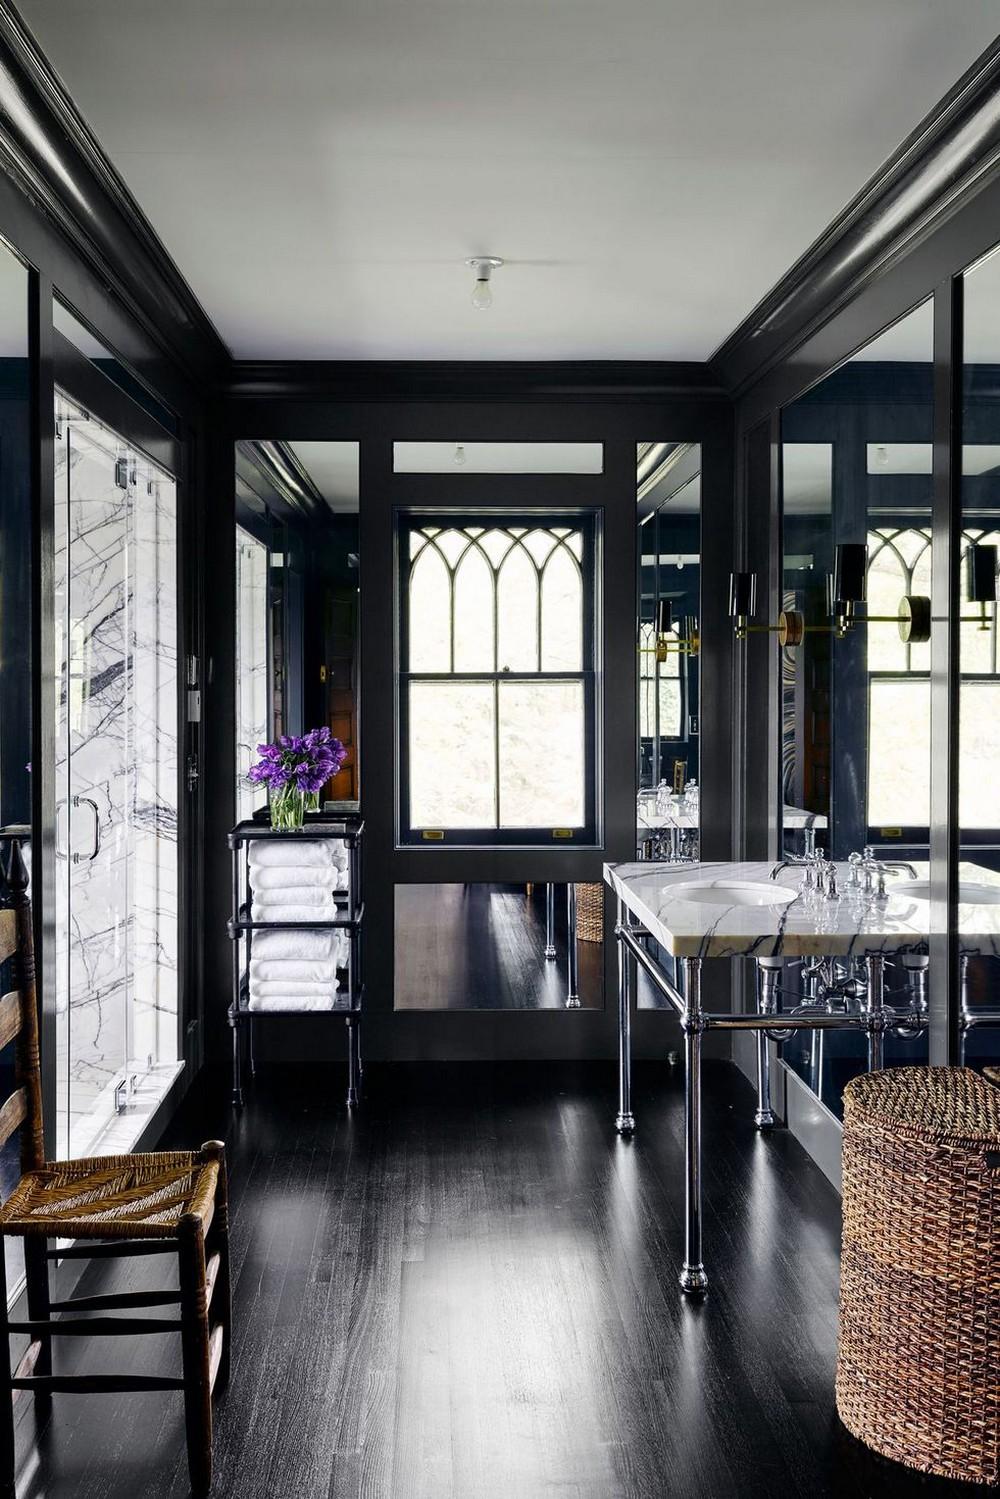 Elle Decor Elle Decor's Hot List For The Ultimate Luxury Bathroom Elle Decors Hot List For The Ultimate Luxury Bathroom 7